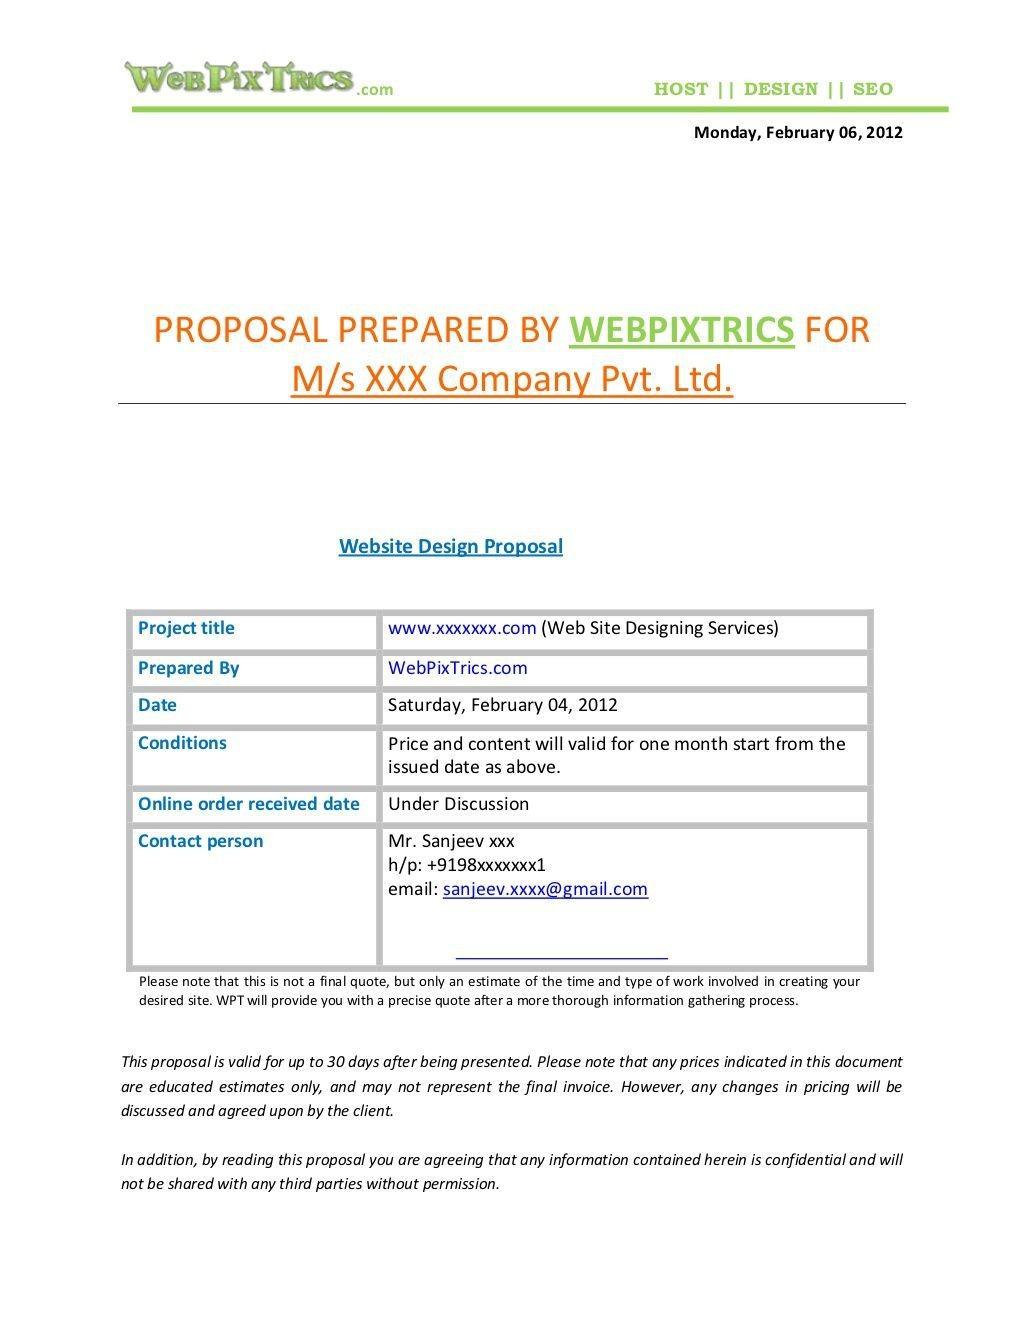 007 Unbelievable Freelance Website Design Proposal Template High Def Large